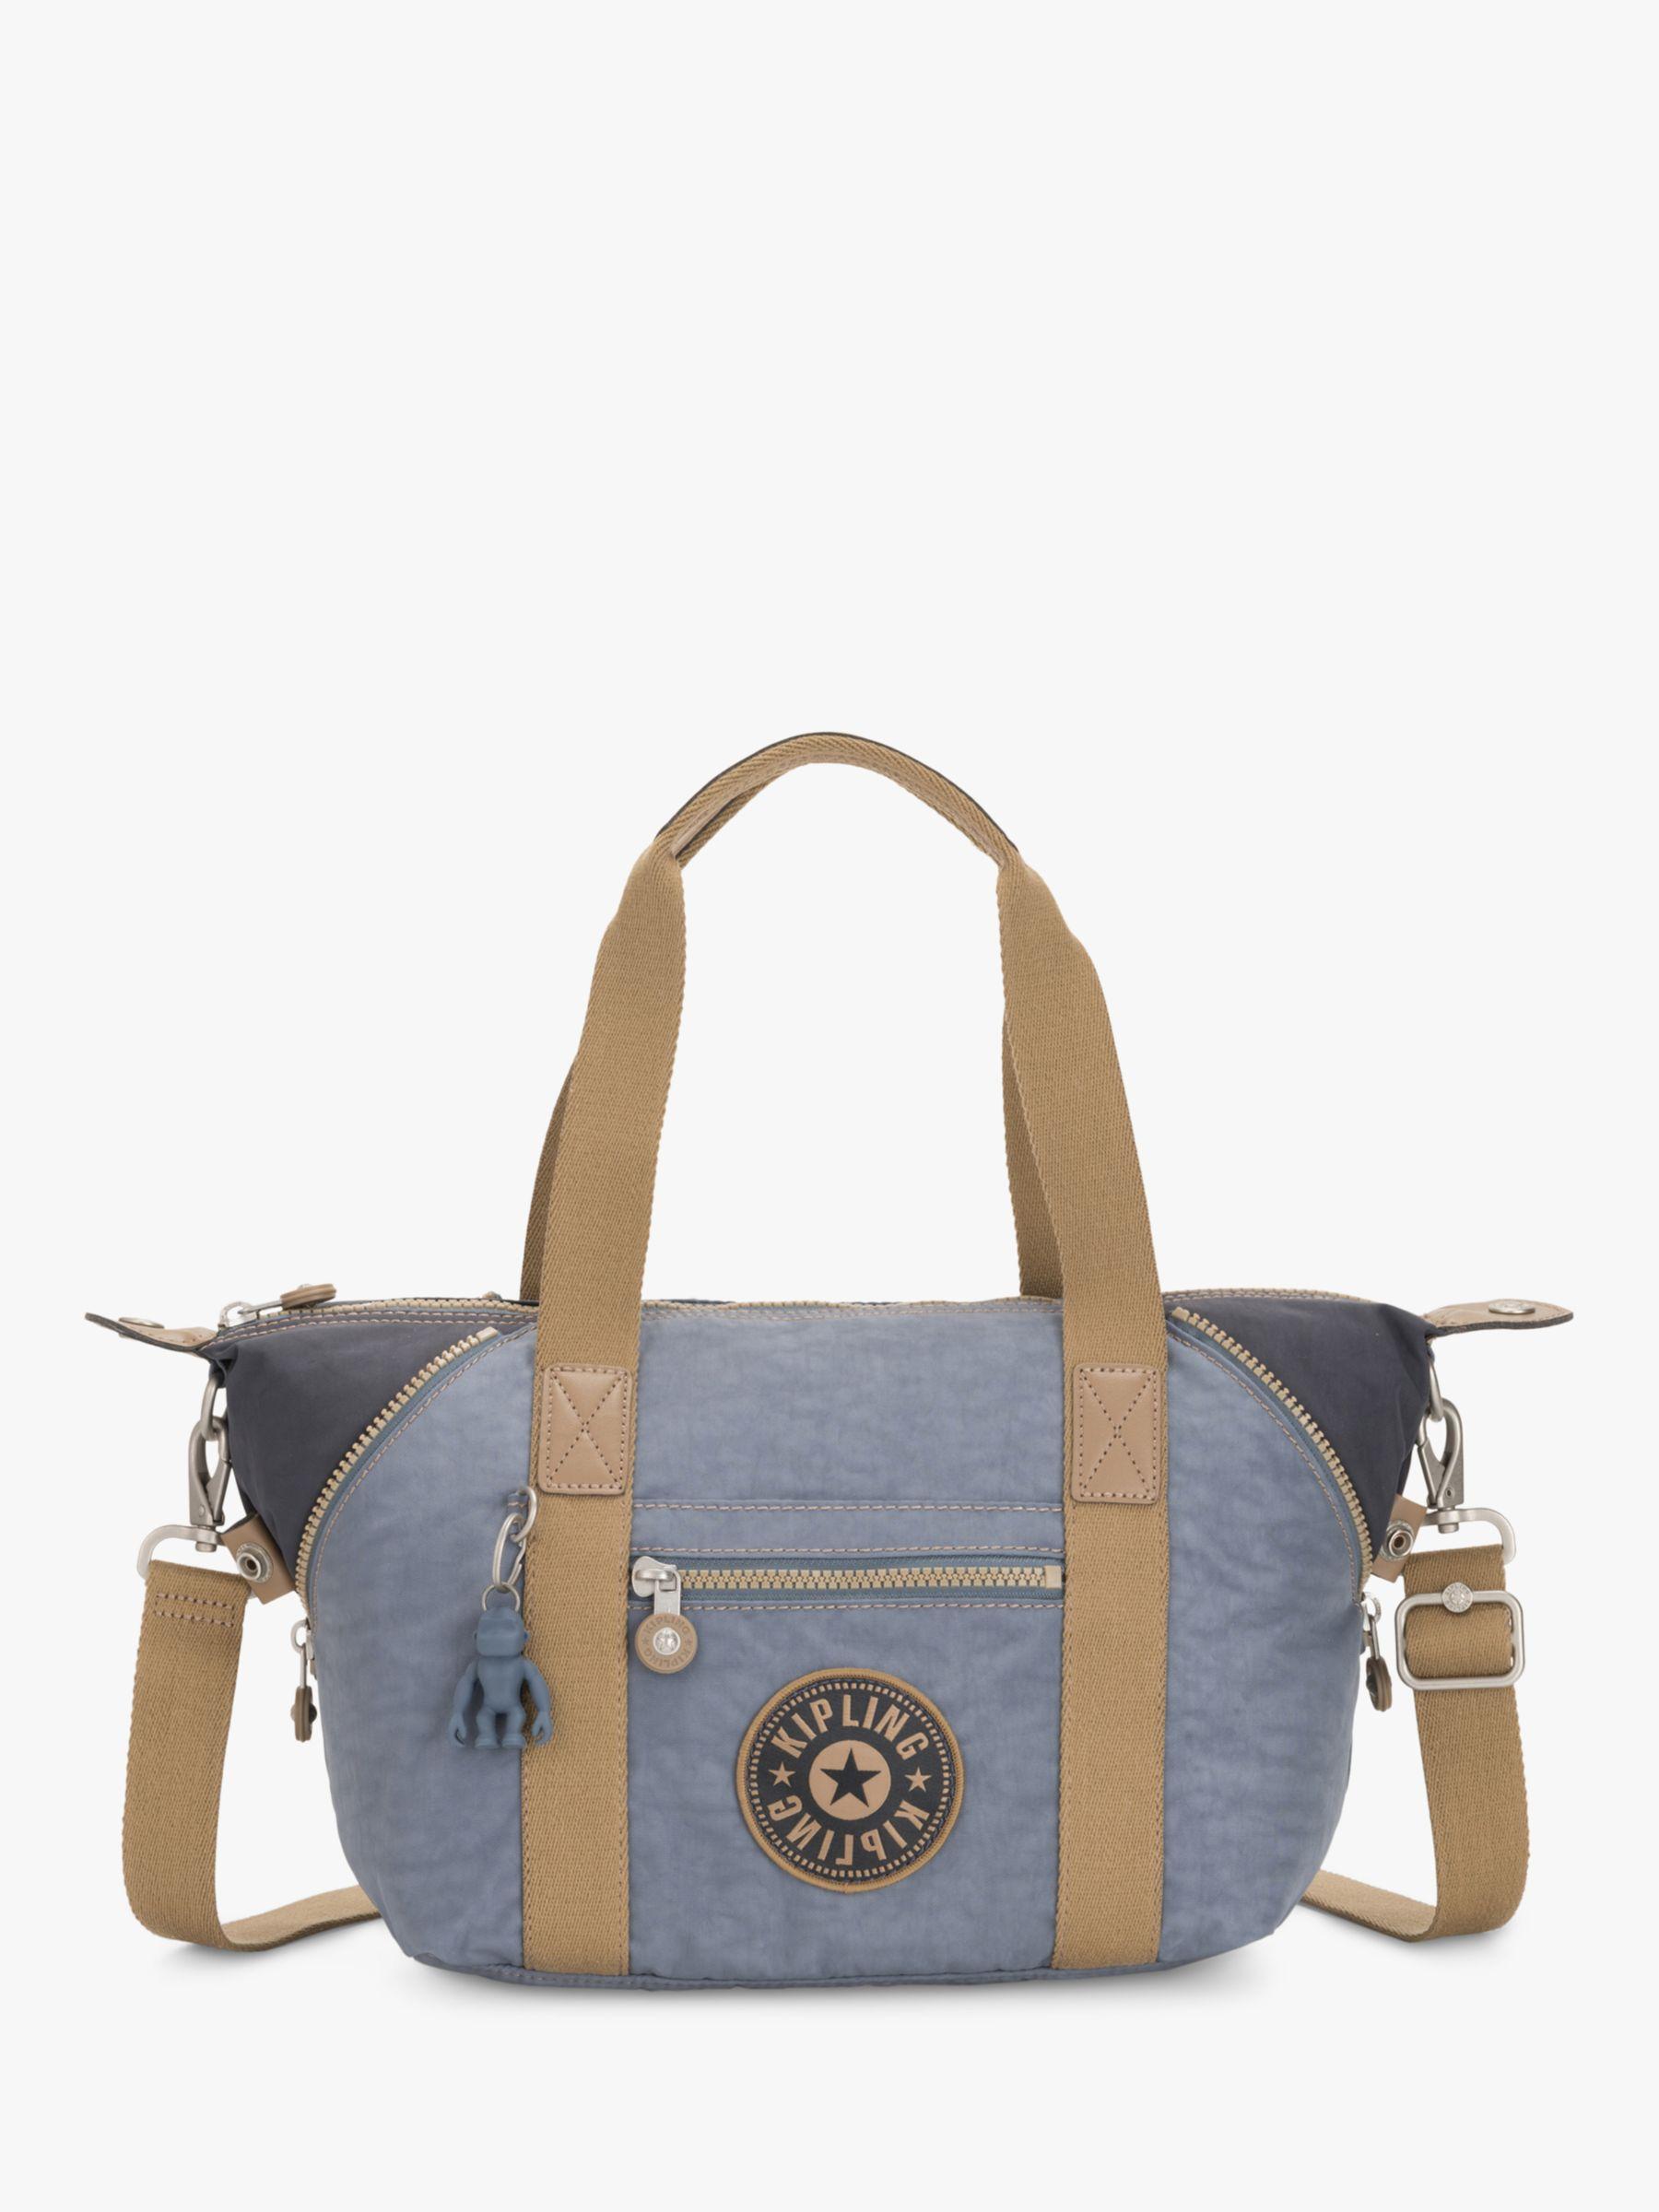 Kipling Kipling Art Mini Tote Bag